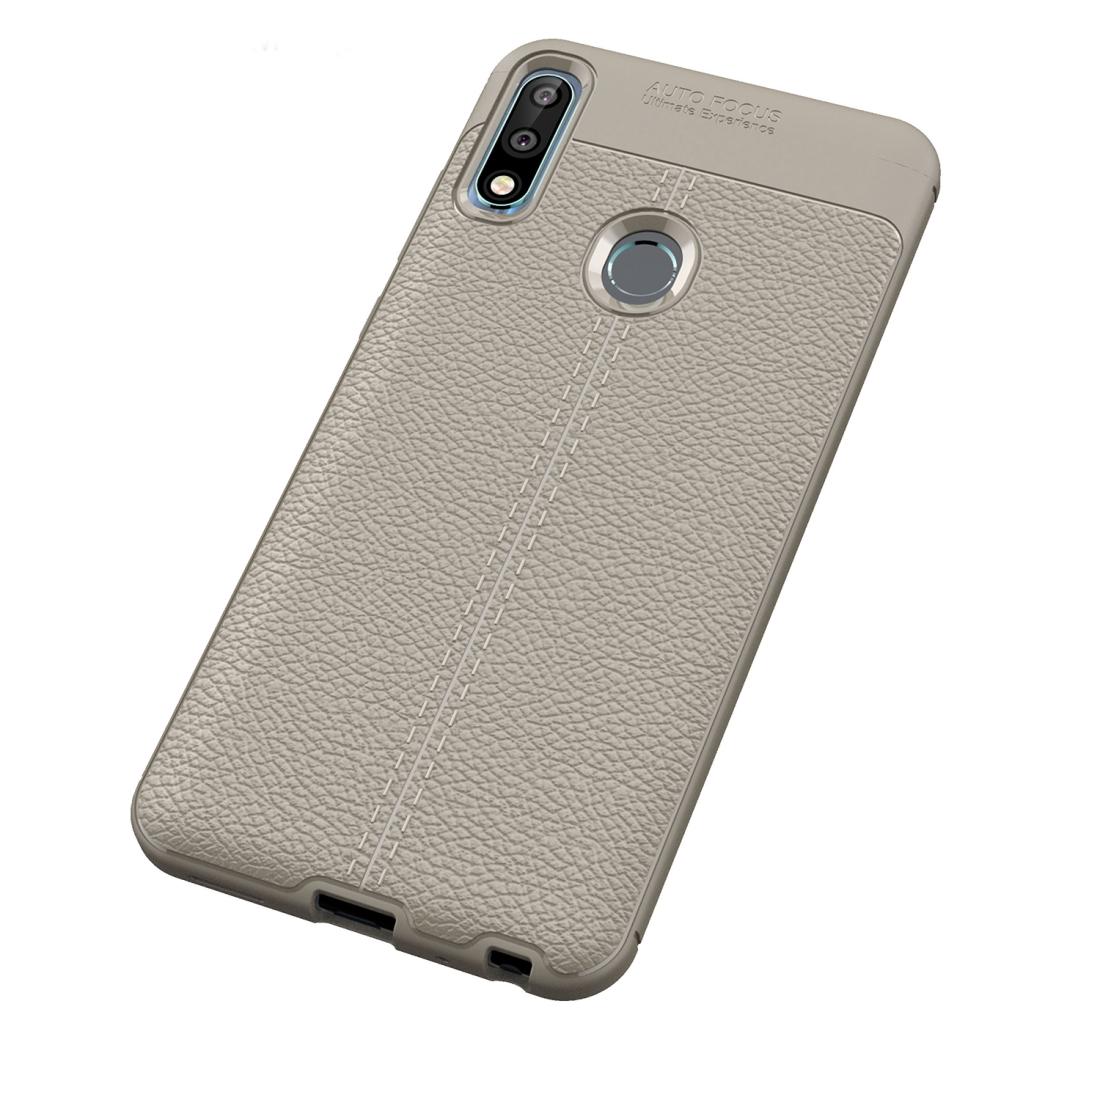 huge discount 47859 cc445 Litchi Texture TPU Shockproof Case for ASUS Zenfone Max Pro (M2) (Grey)